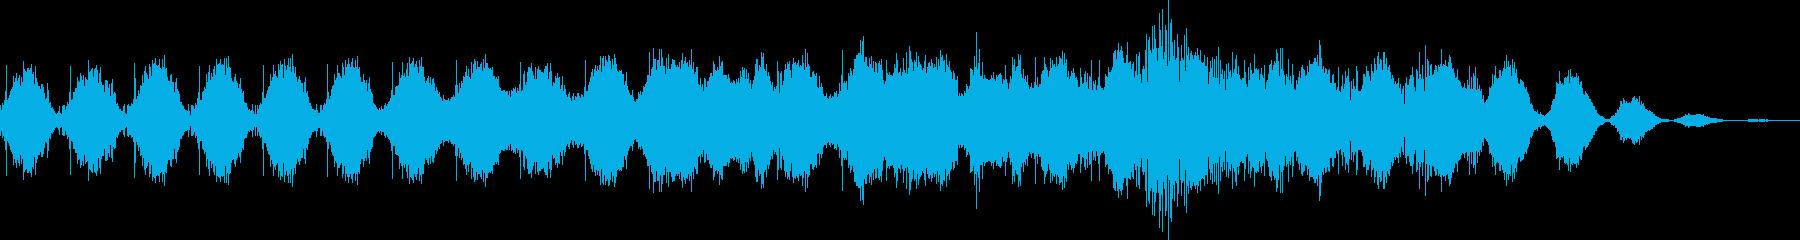 ambient の再生済みの波形